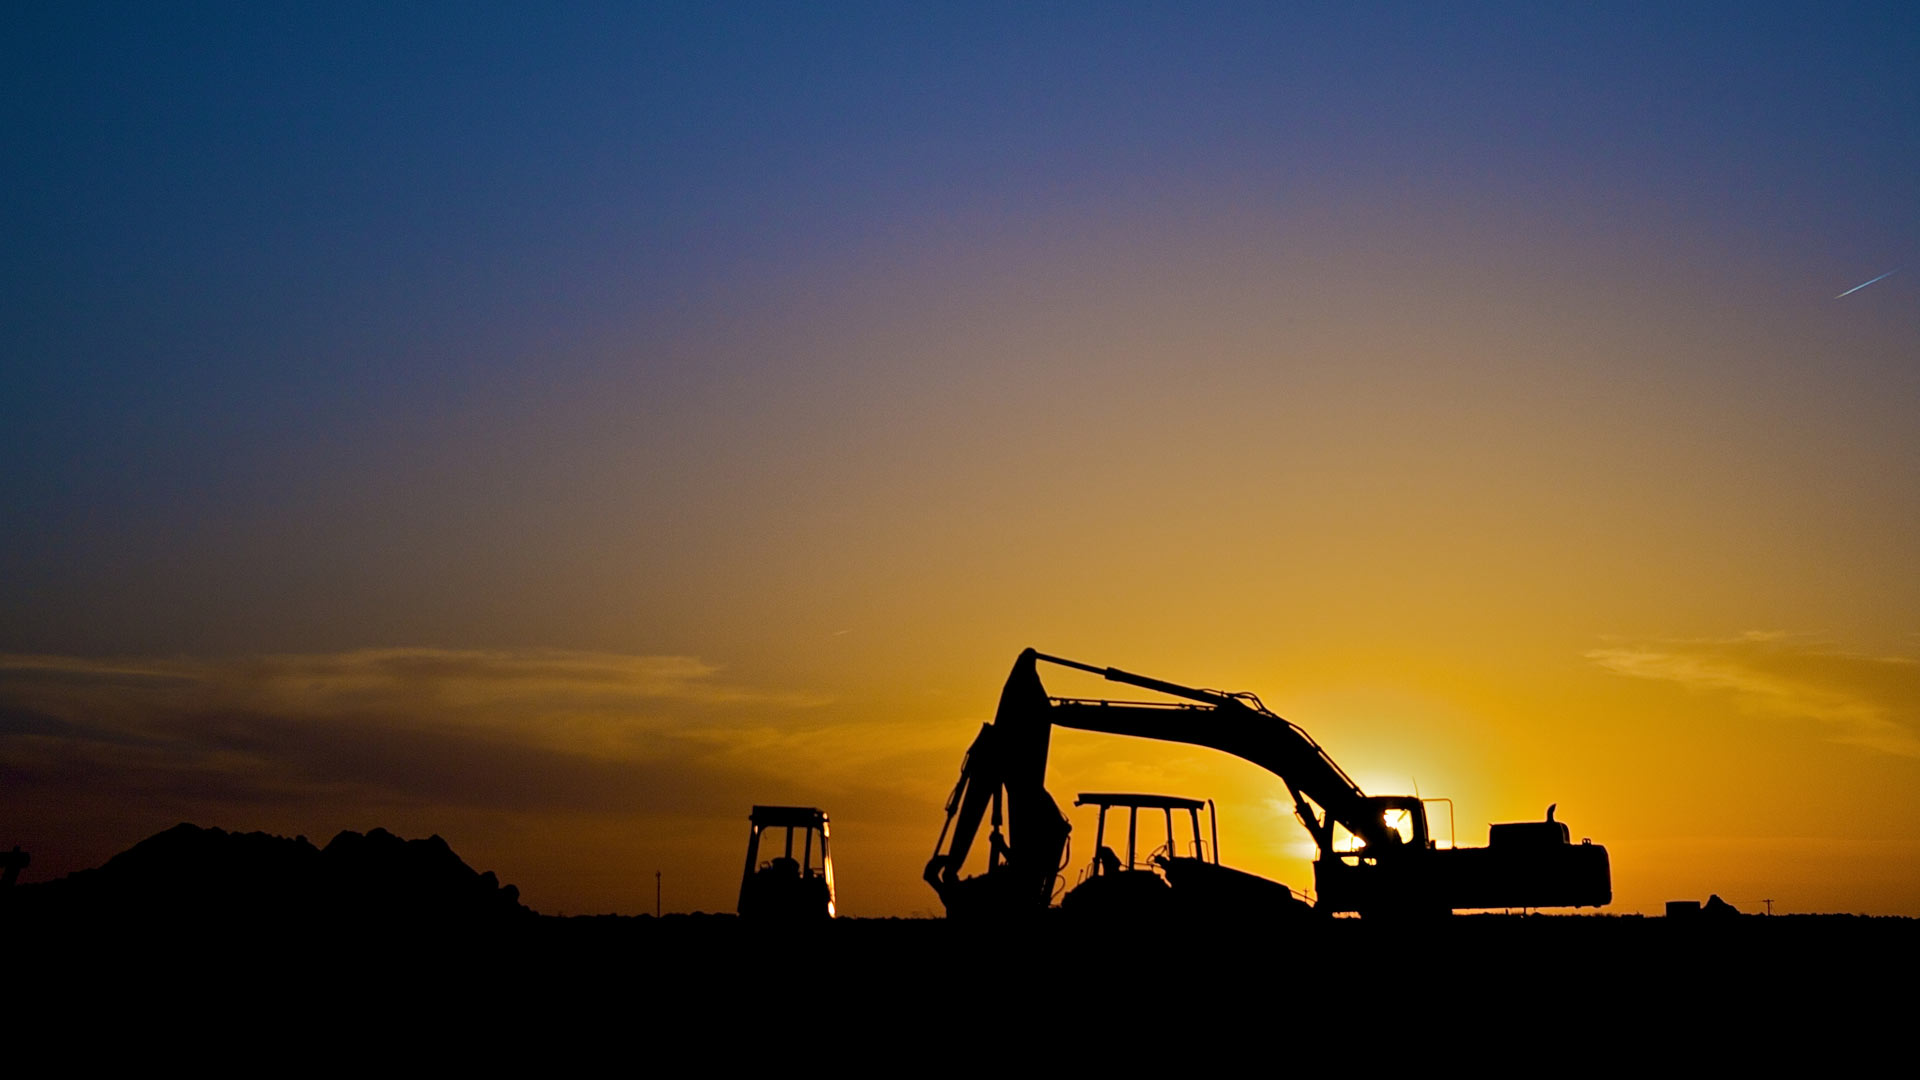 Oil rigs at night